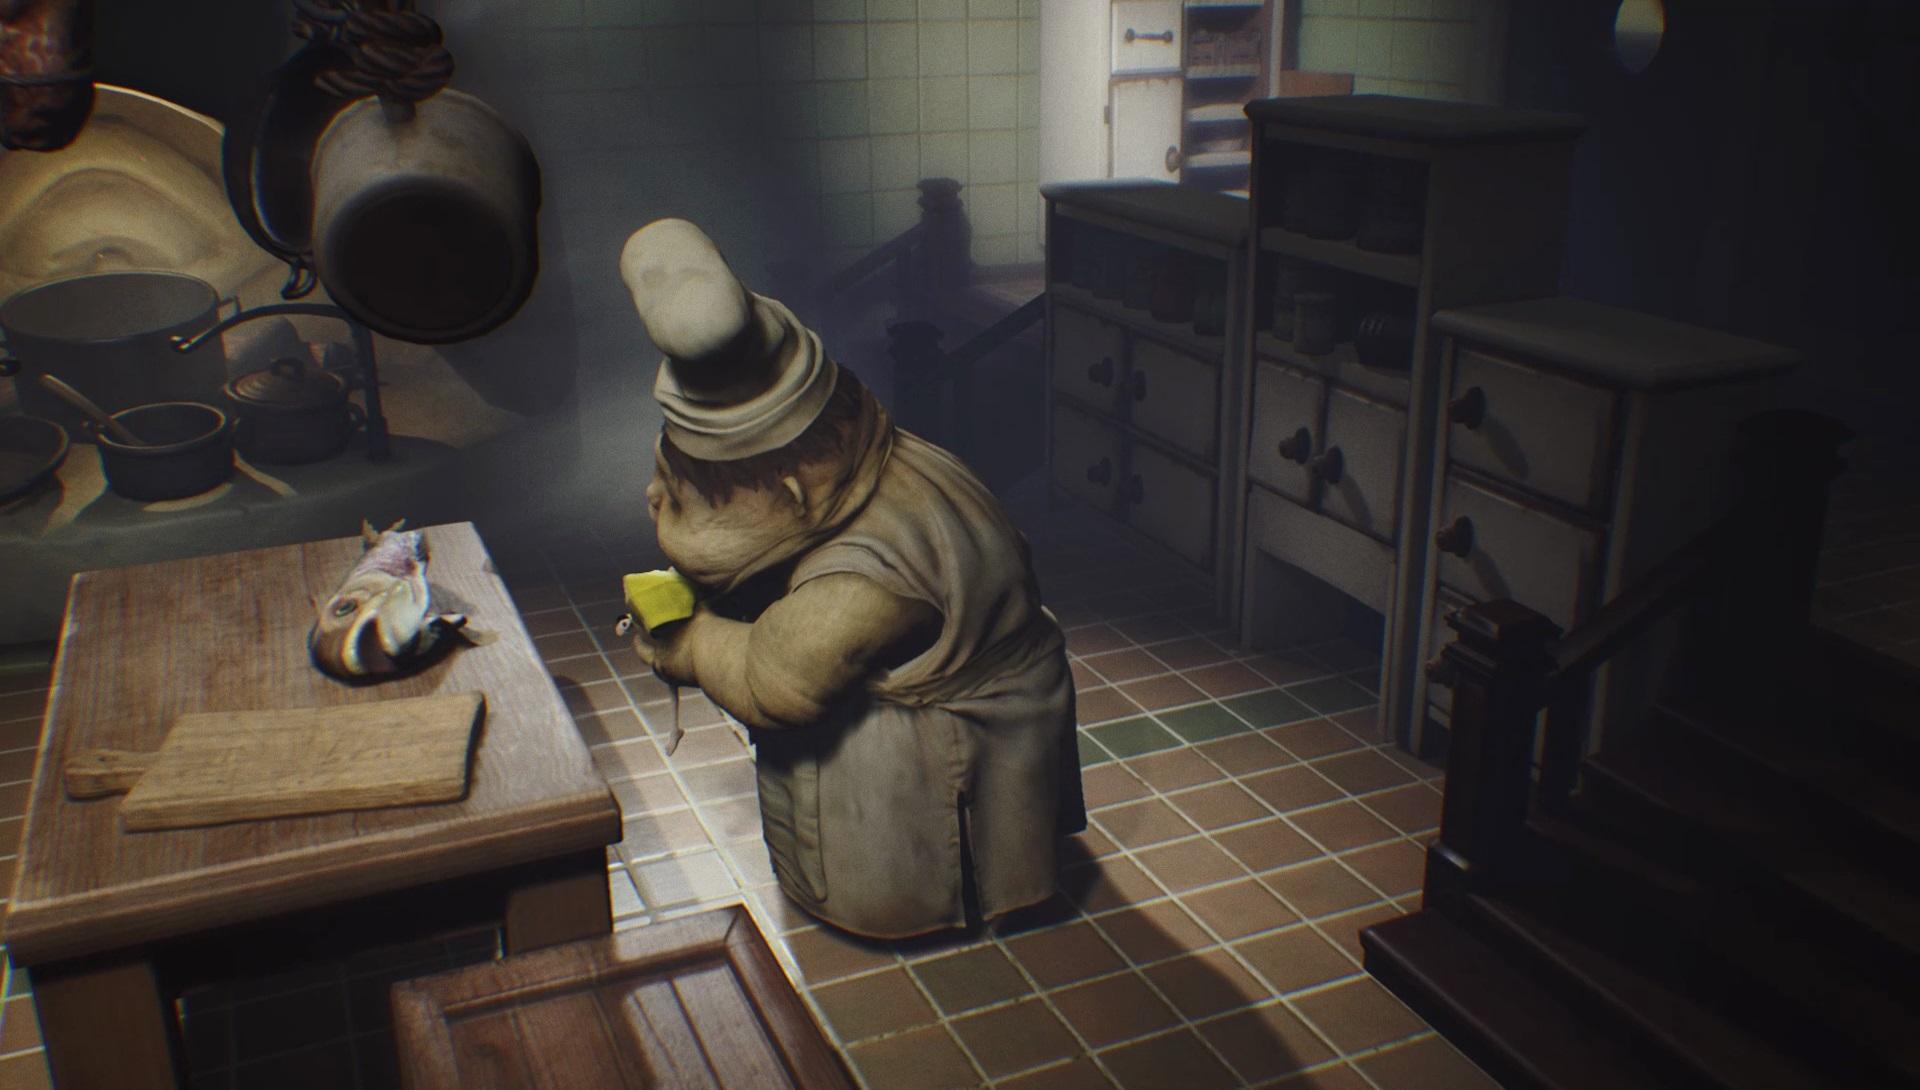 Kitchen Nightmares Fanfiction